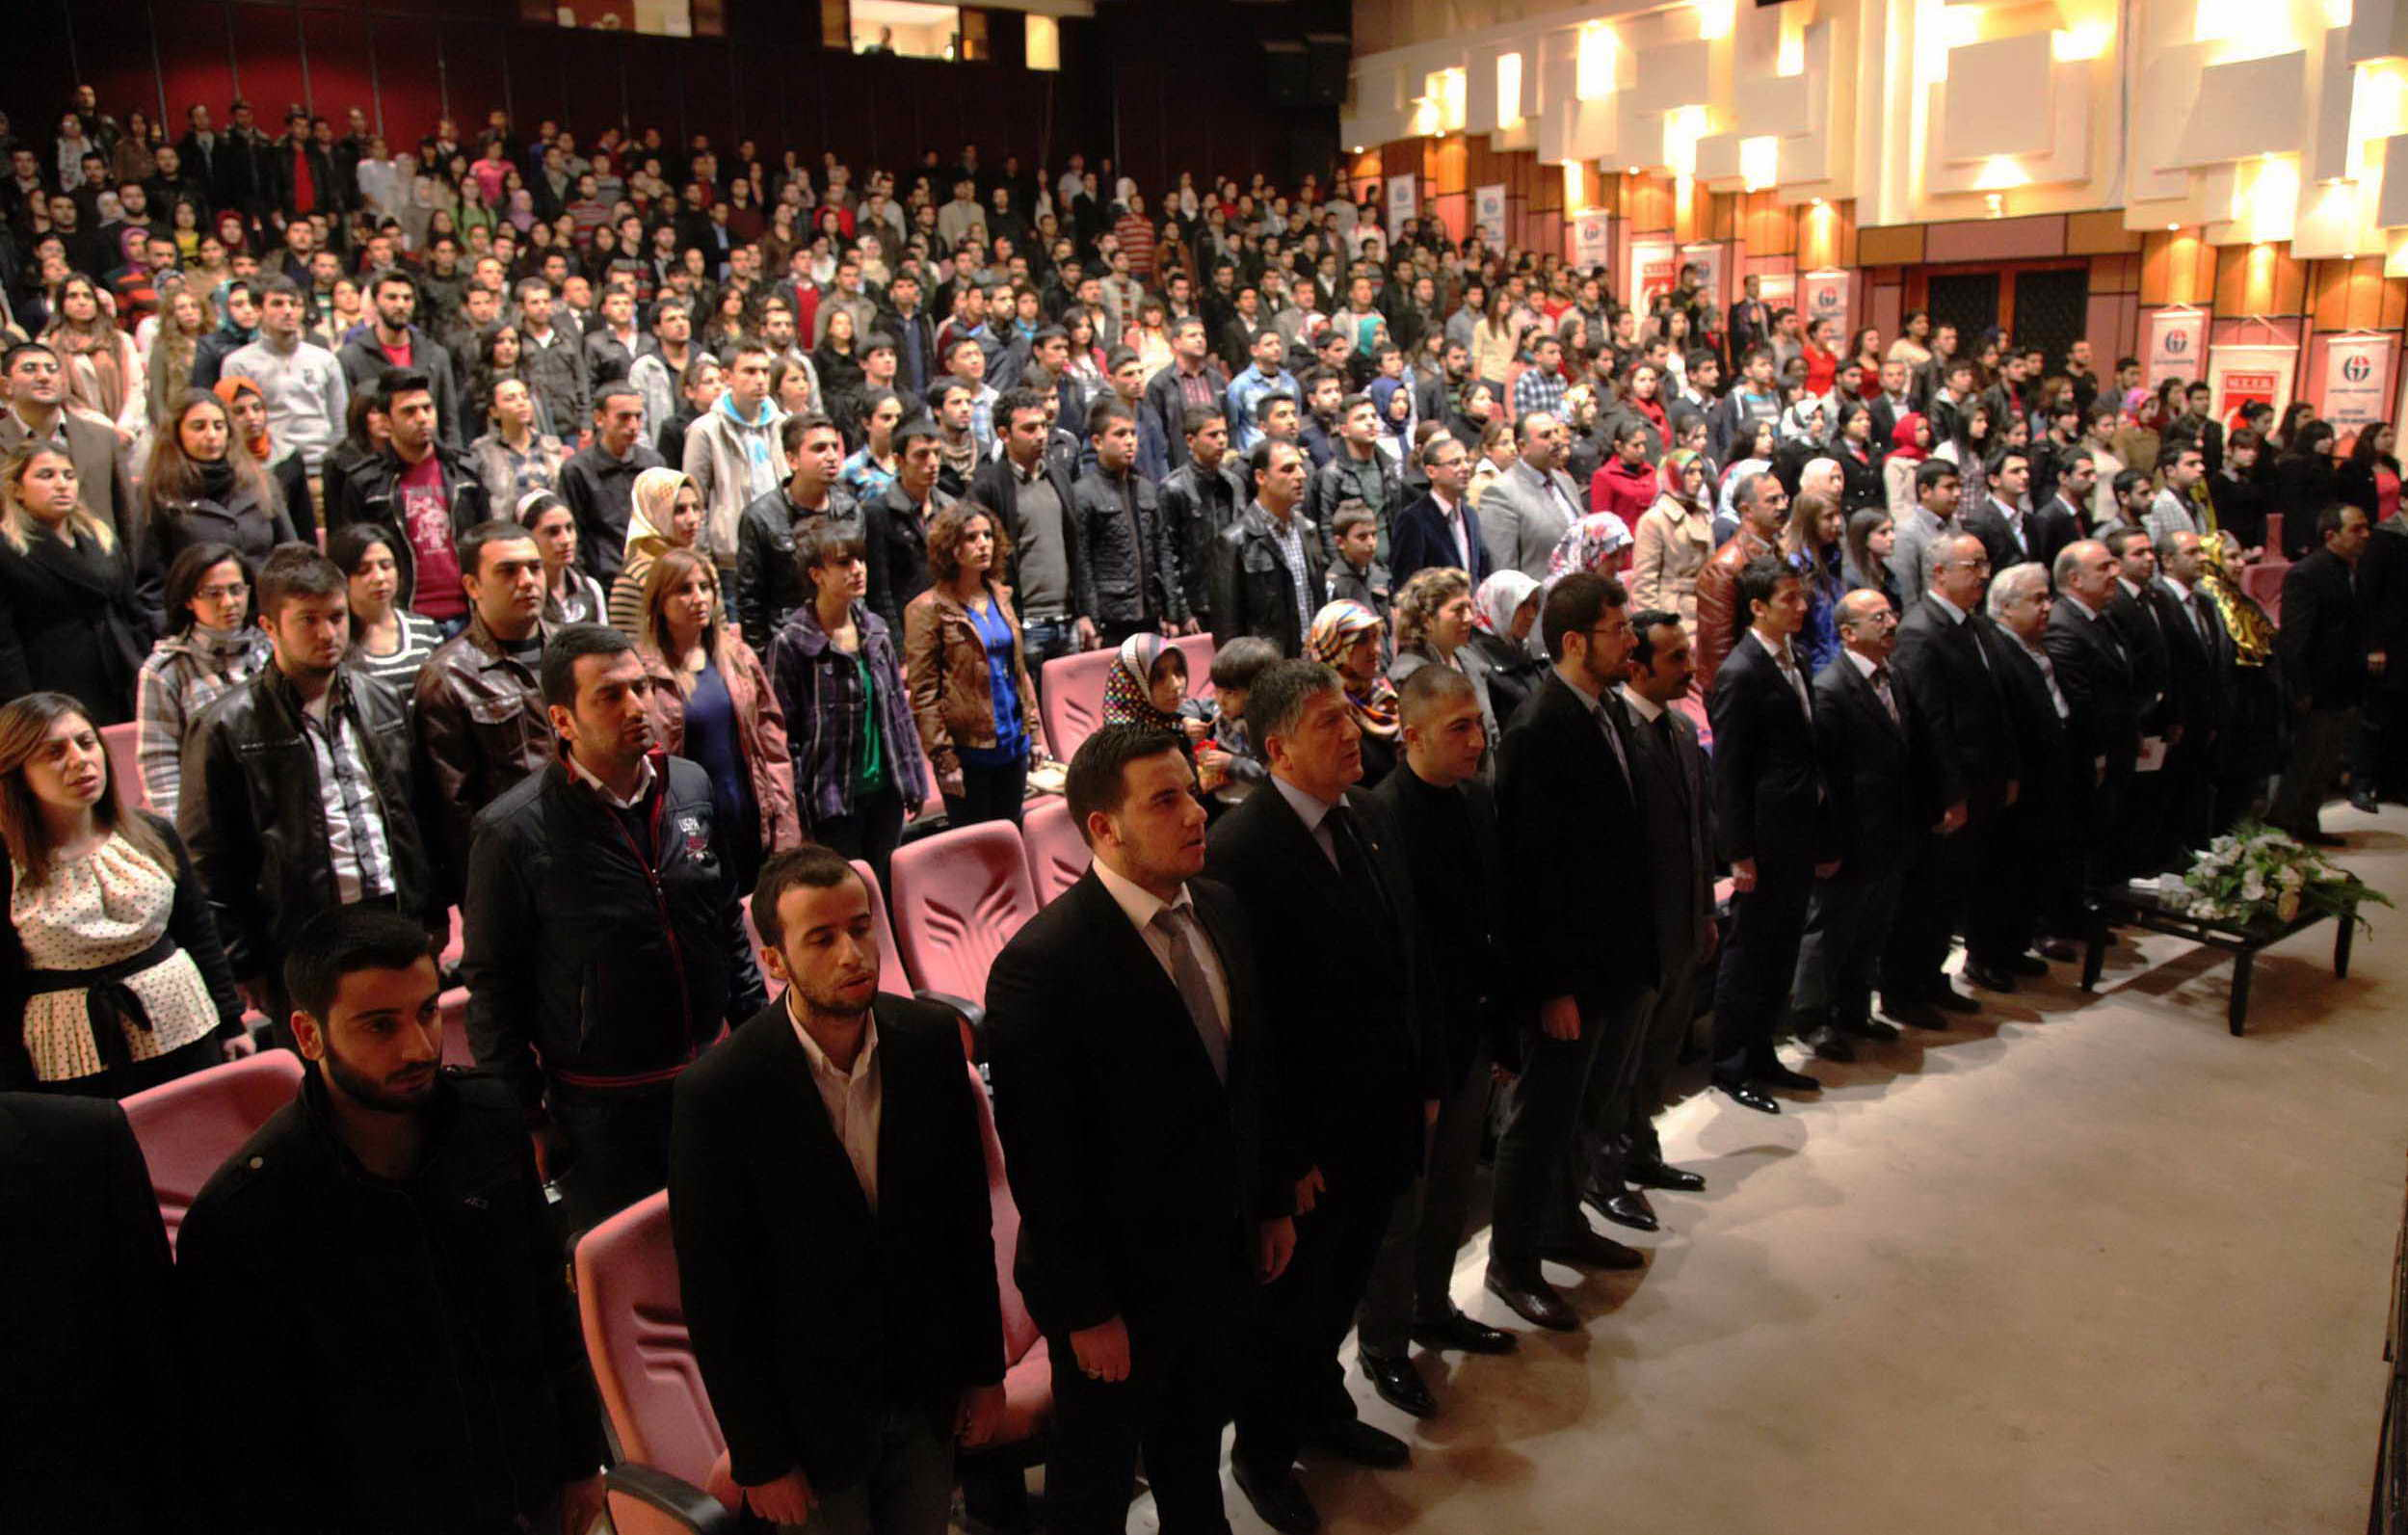 Mehmet_Akif_Ersoy_Anma_Töreni_(1)